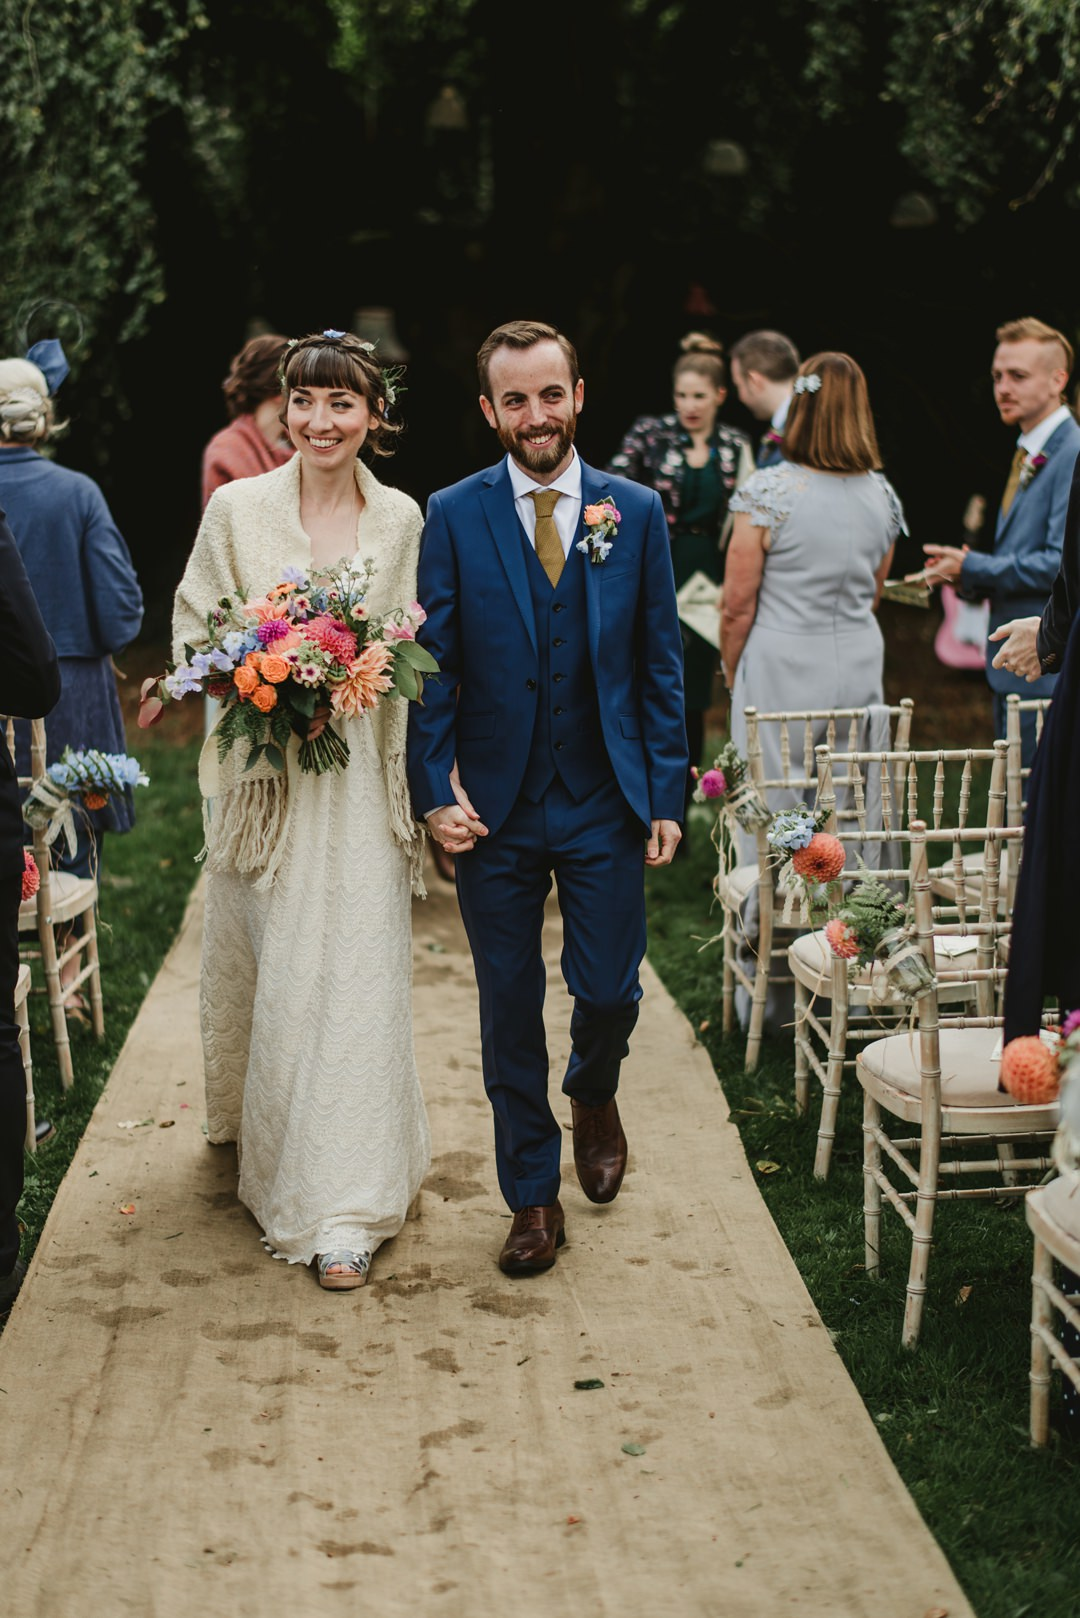 bride and groom walk on jute carpet